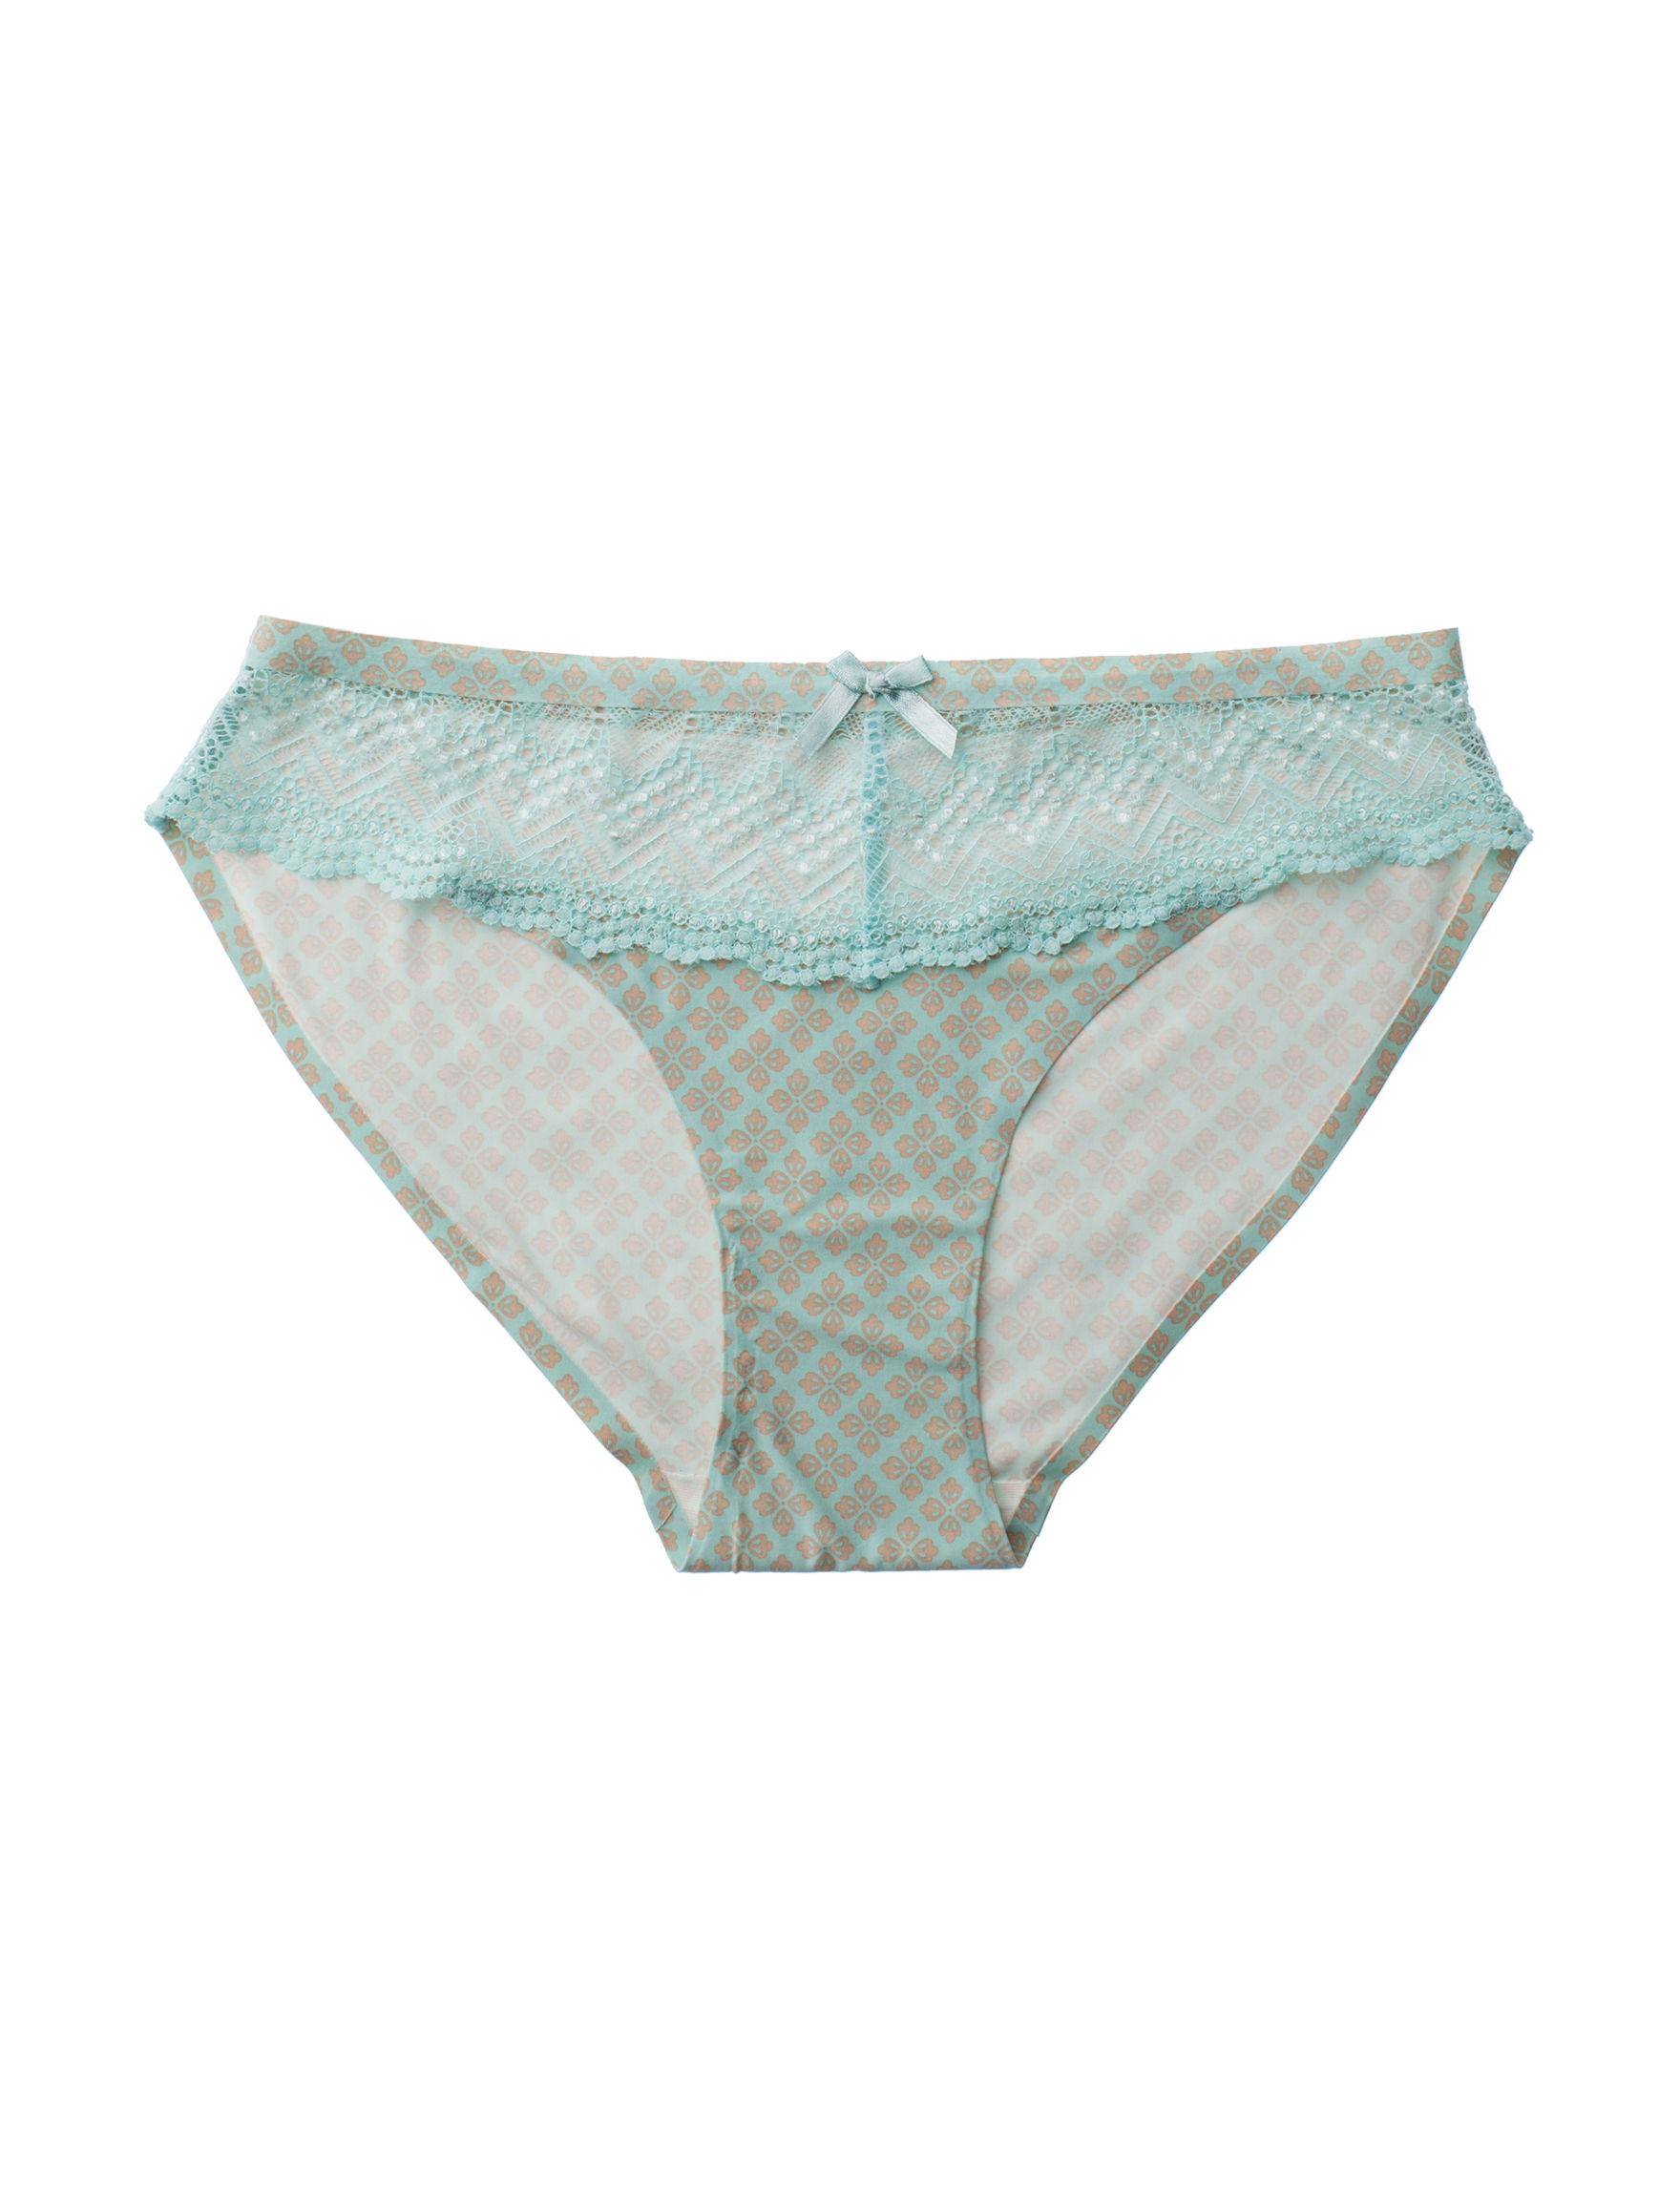 Rene Rofe Teal Panties Bikini